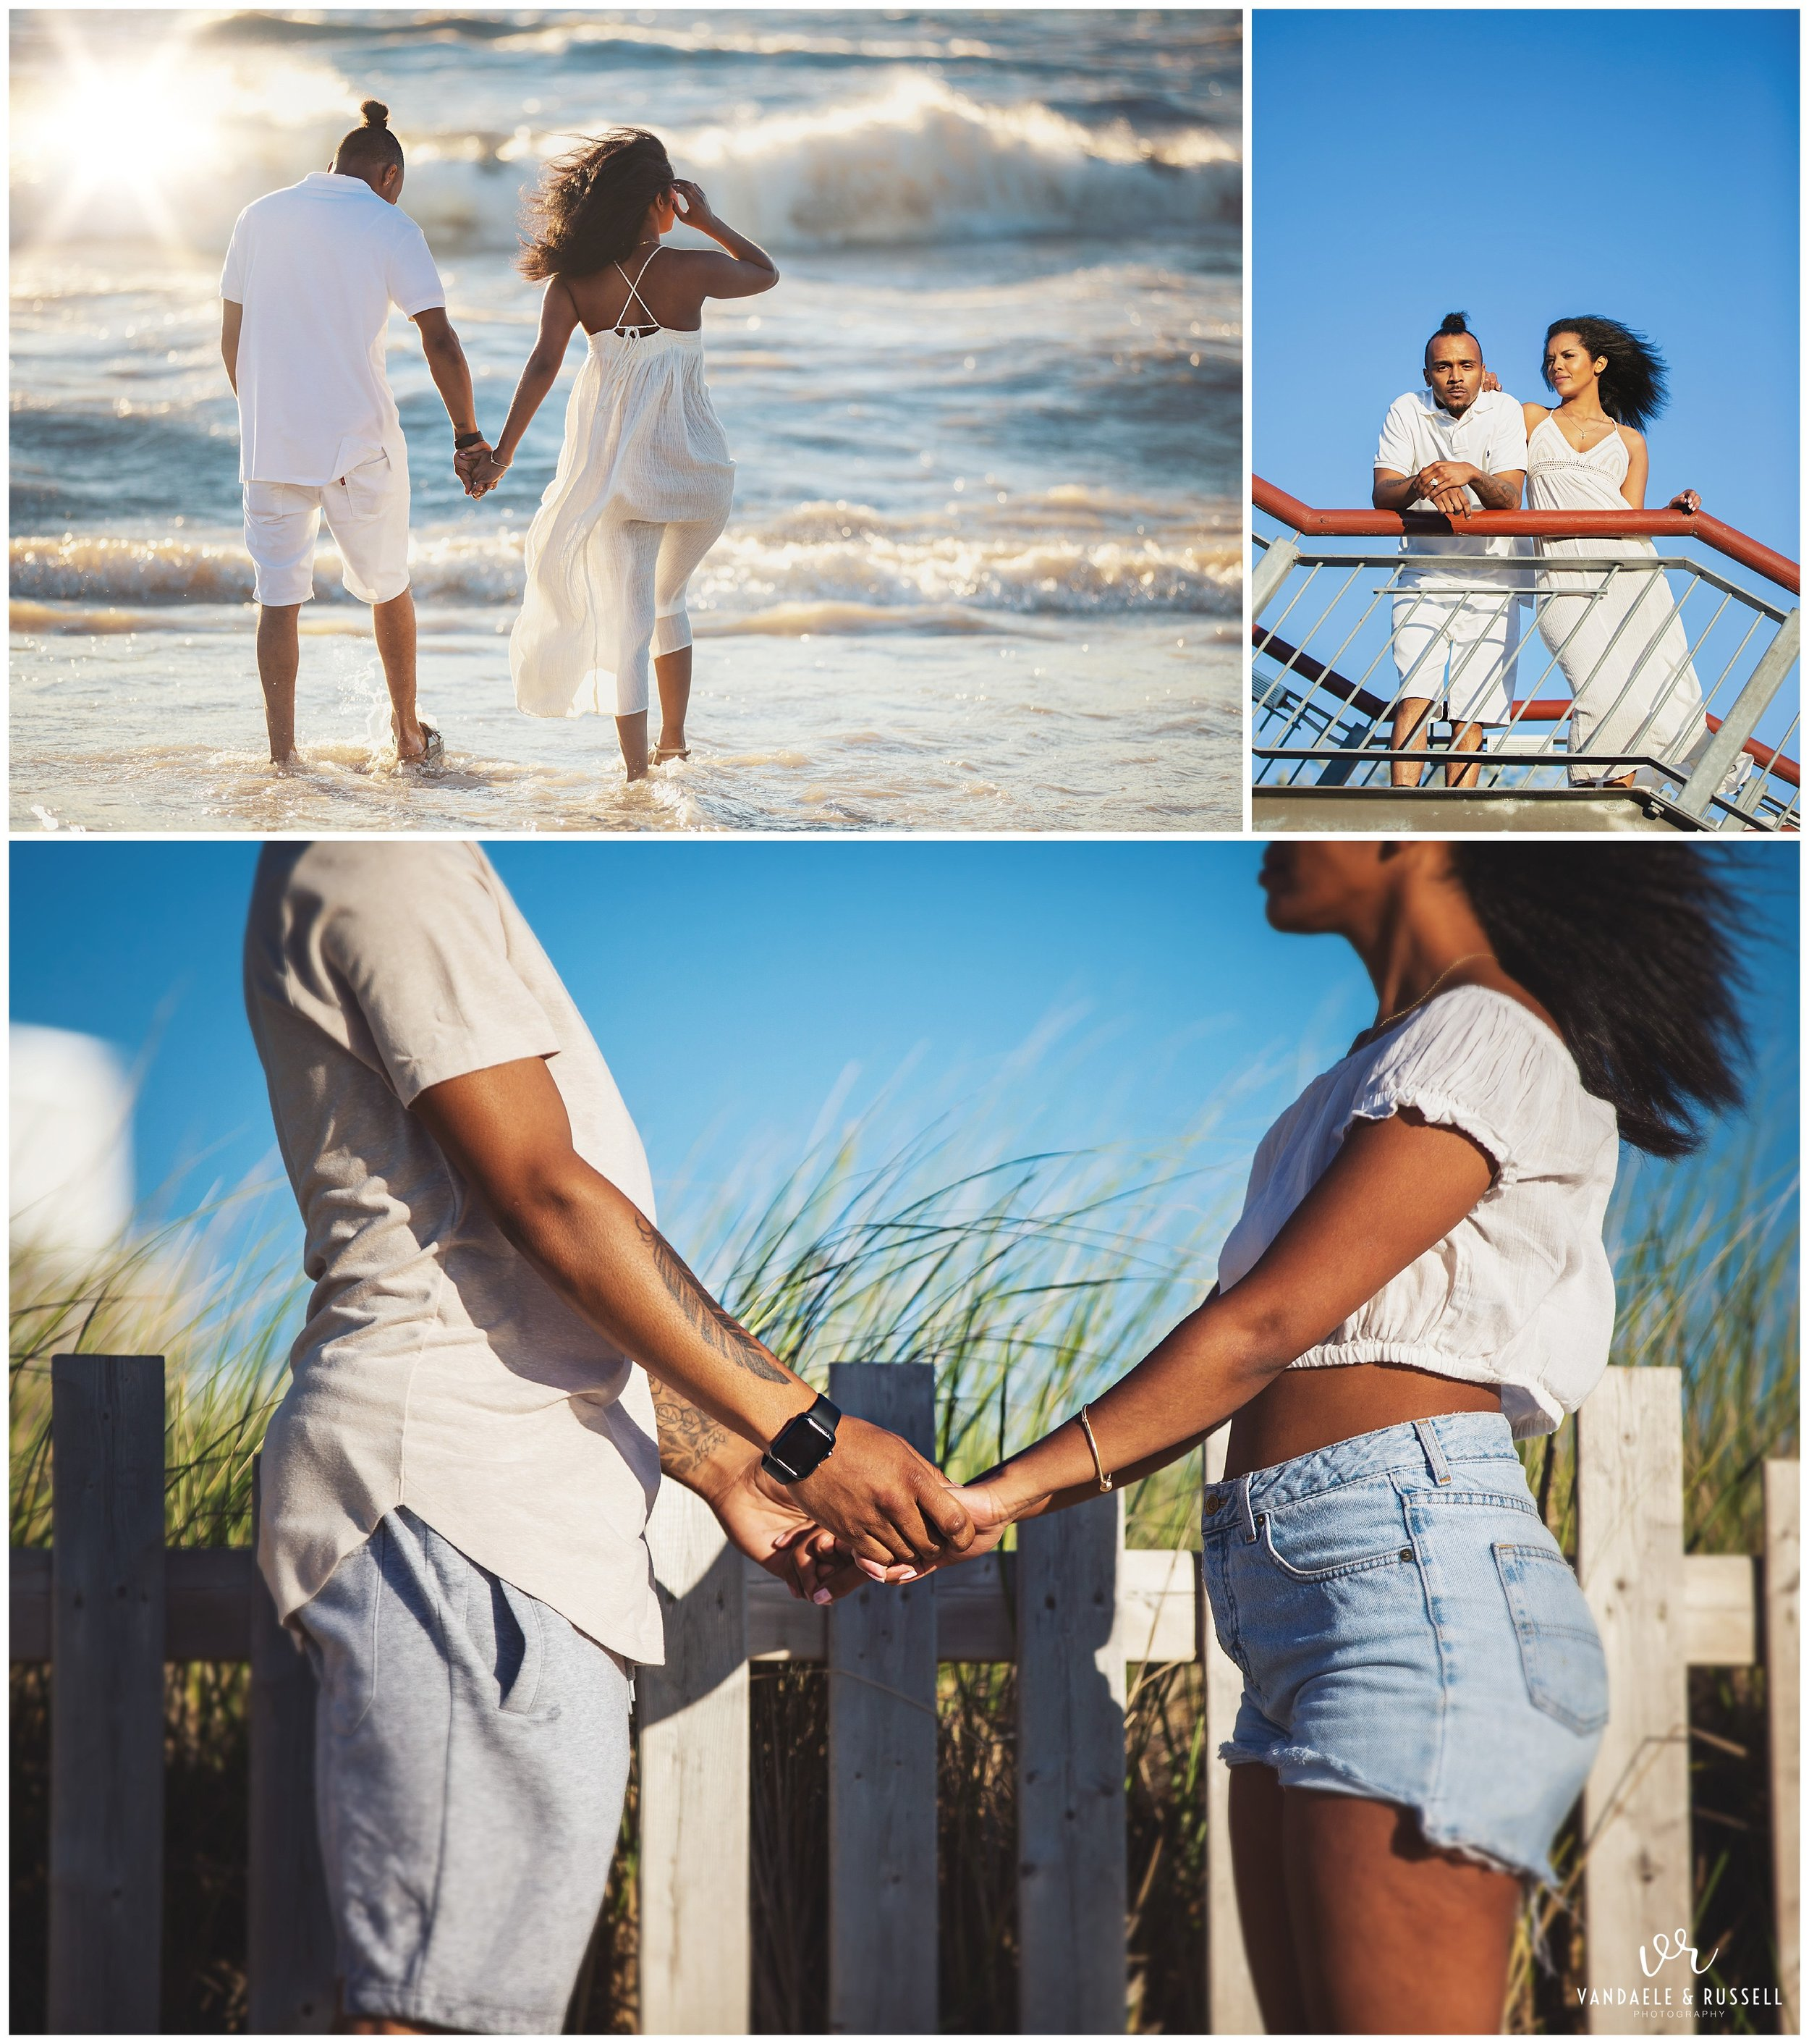 VanDaele-Russell-Wedding-Photography-London-Toronto-Ontario_0134.jpg